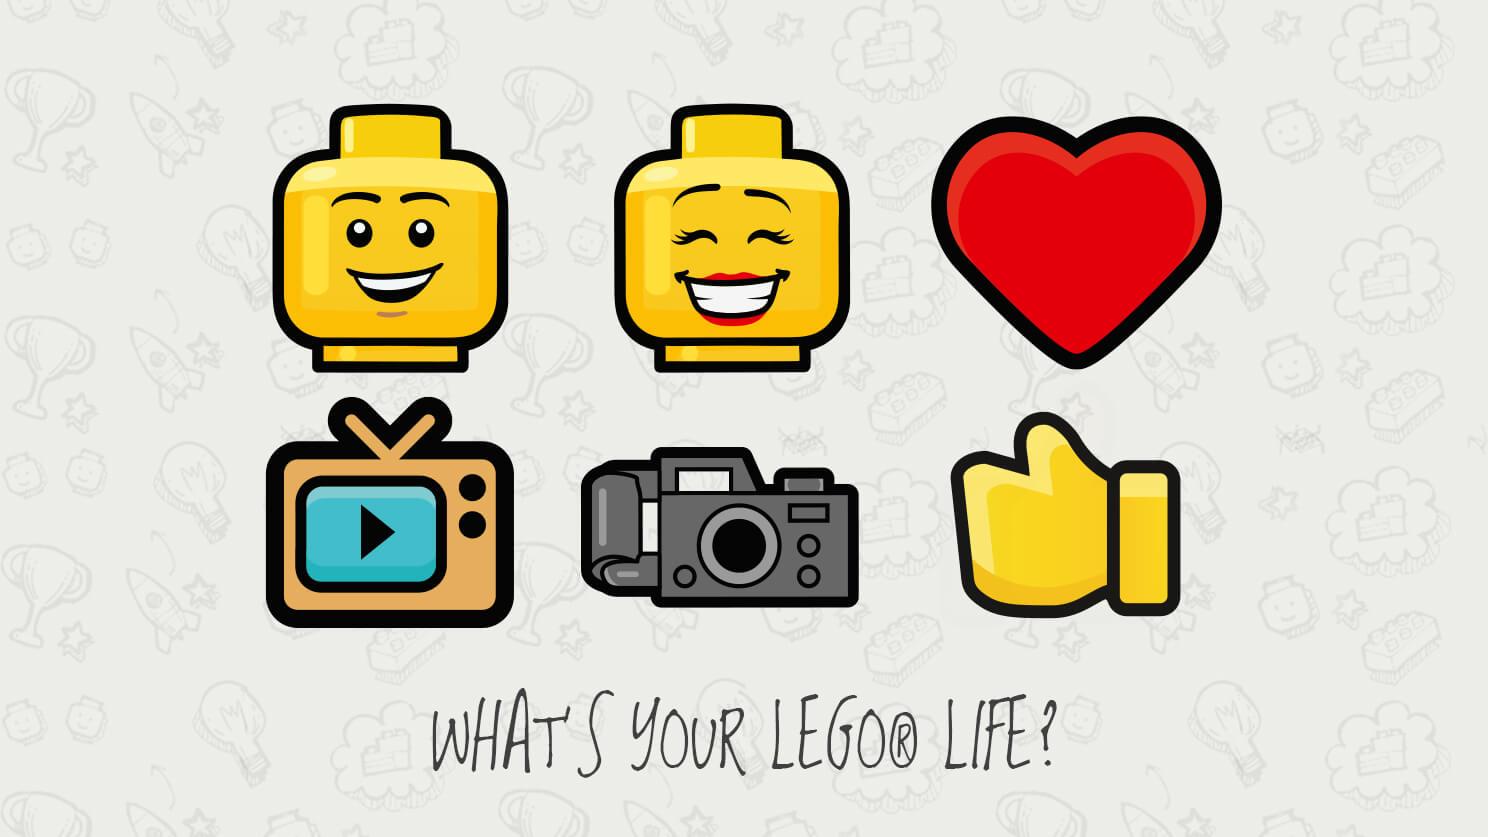 Lego Life App image